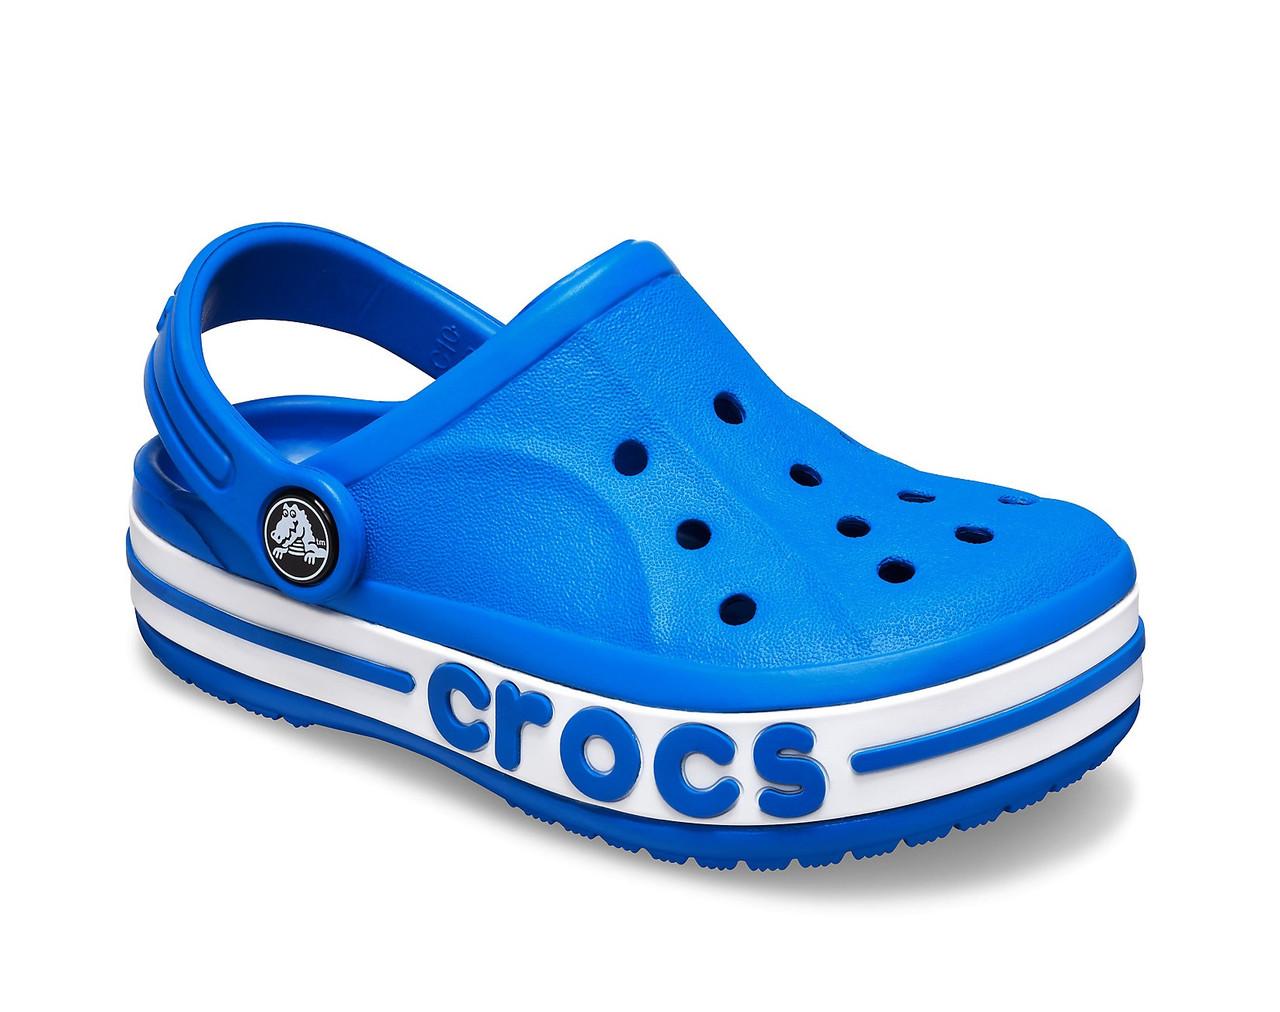 CROCS Kids' Bayaband Clog Bright Cobalt Детские Кроксы Сабо